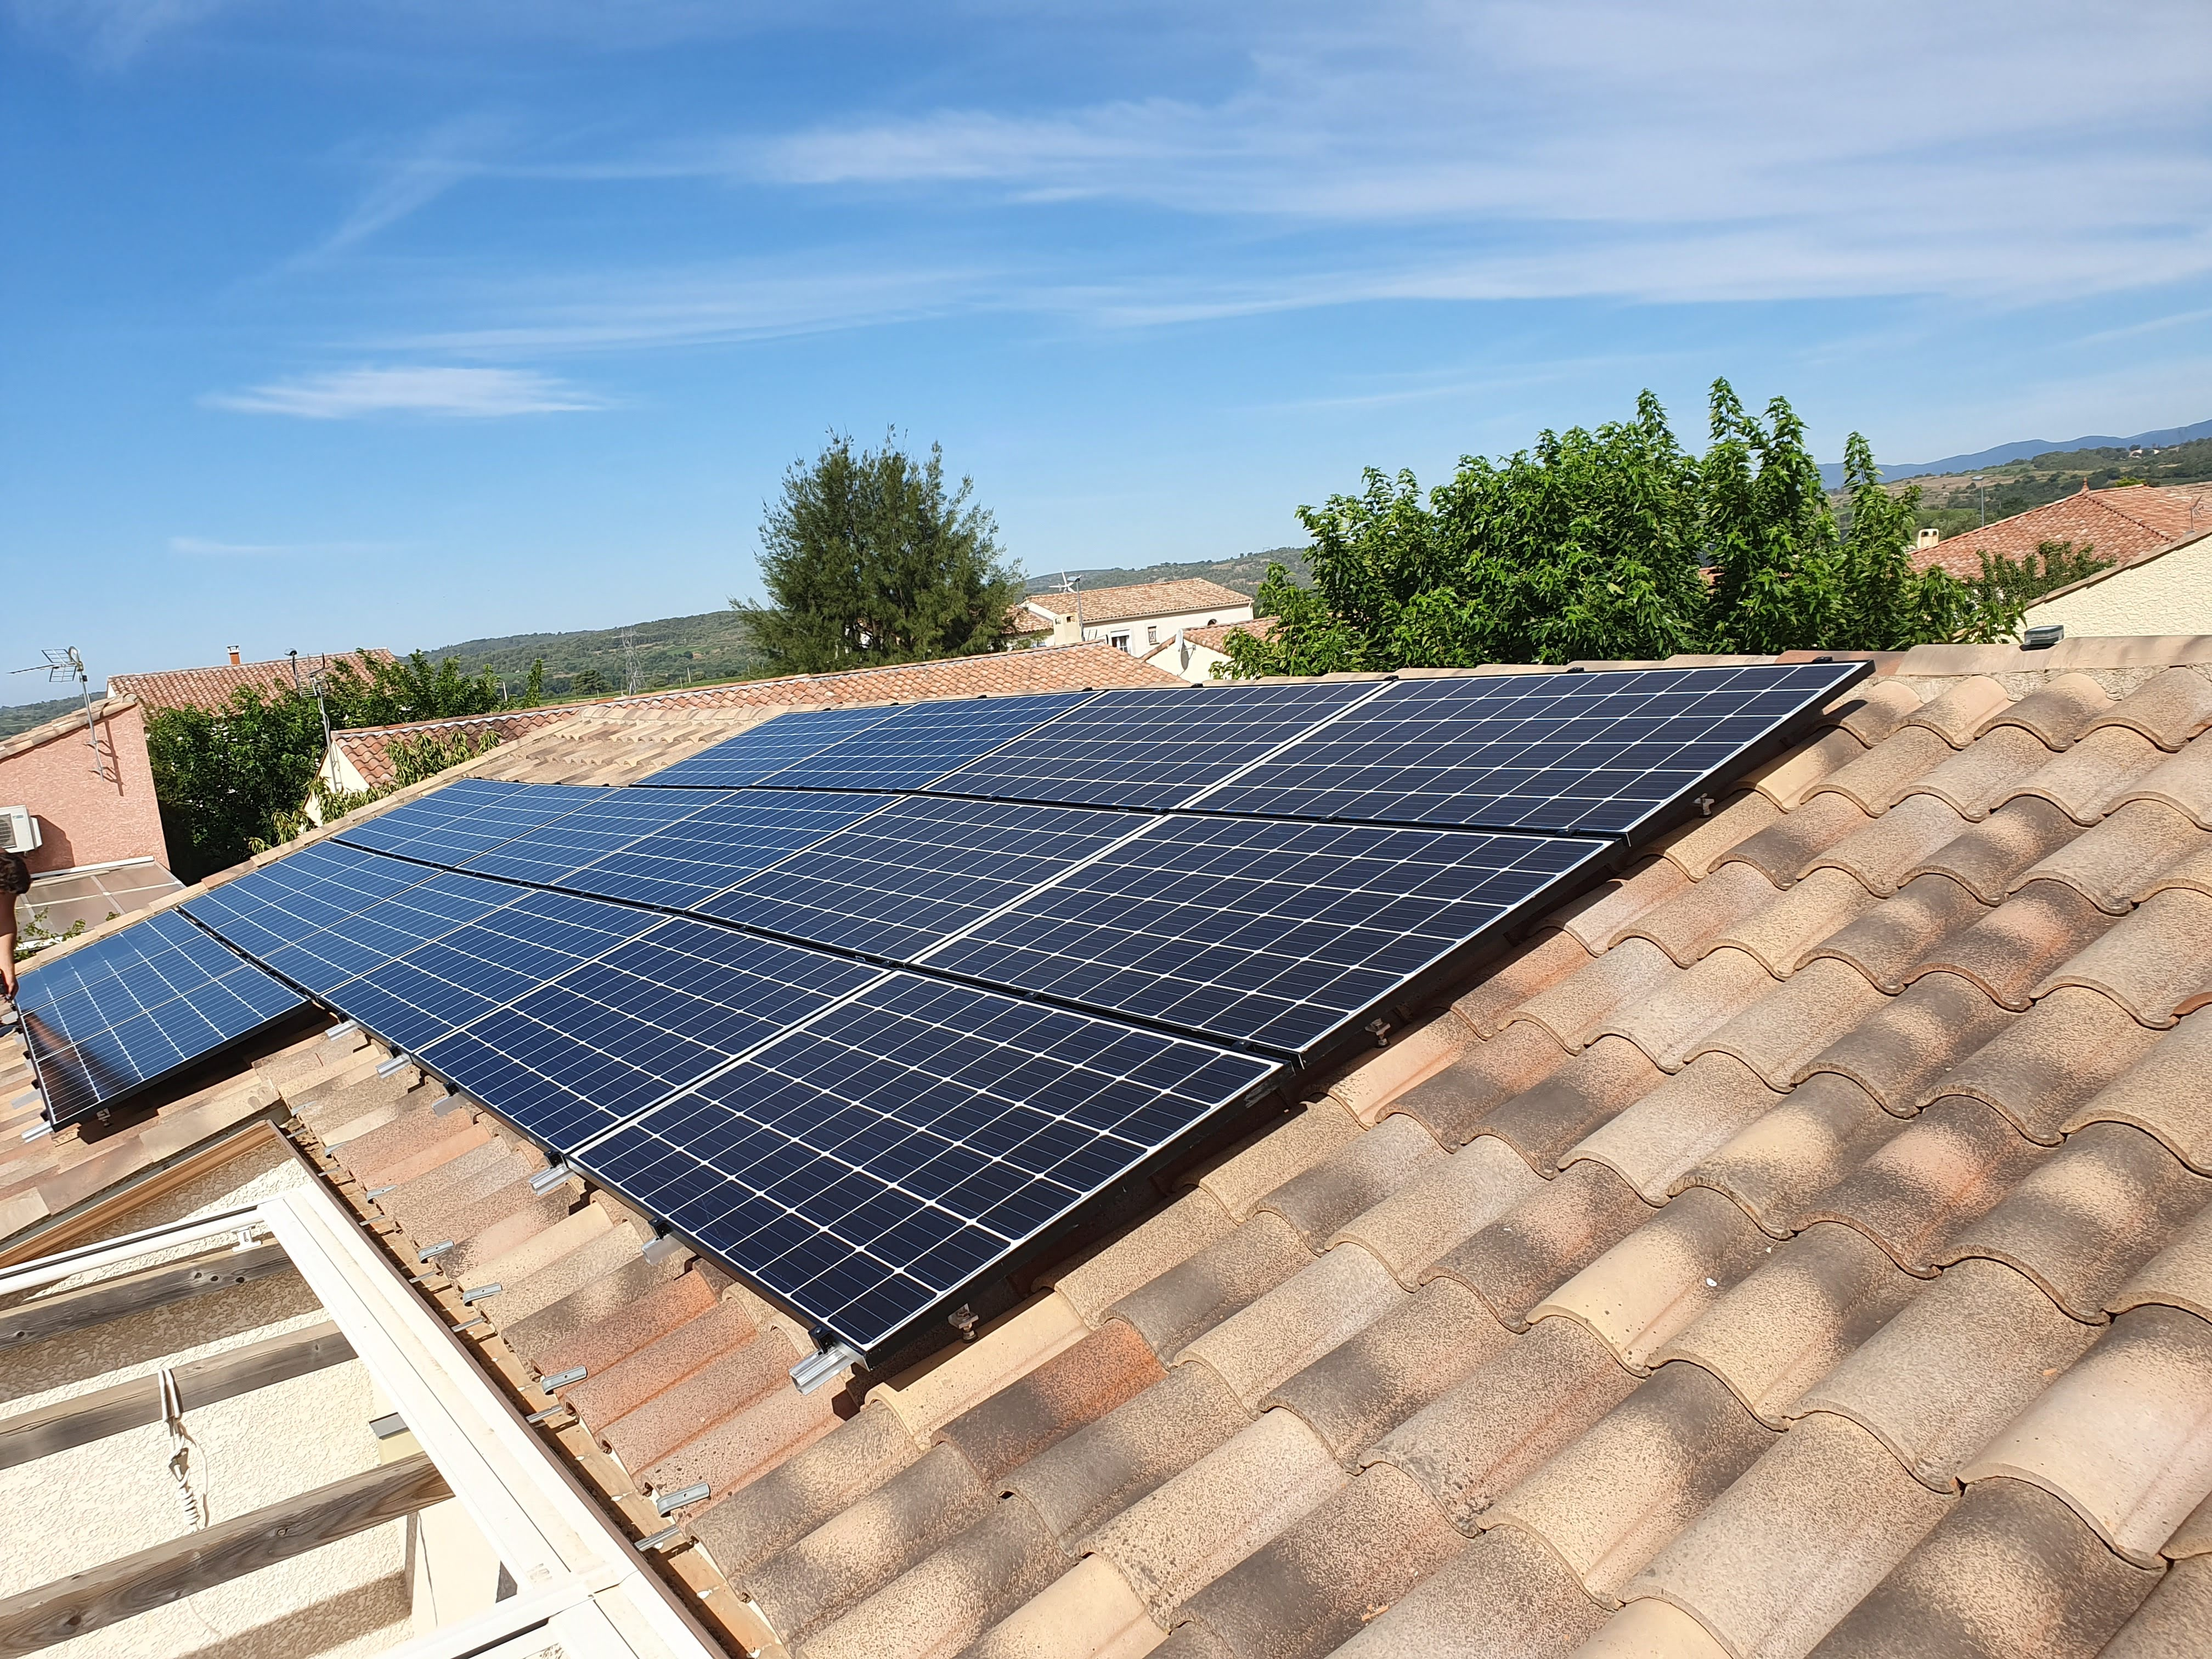 Juillet 2019, 6 kWc, Hérault (34490)